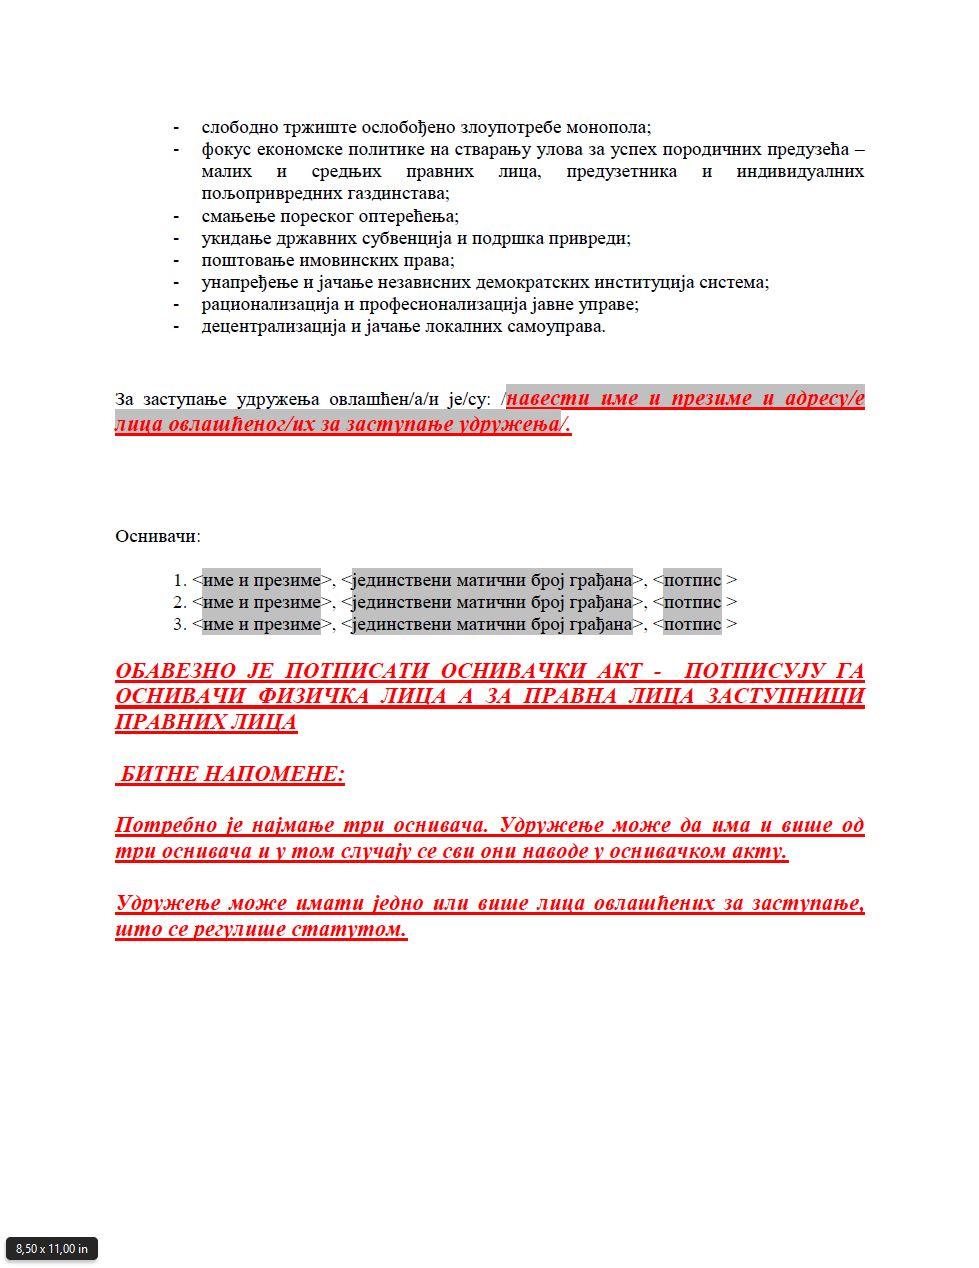 OsnivackiAkt2